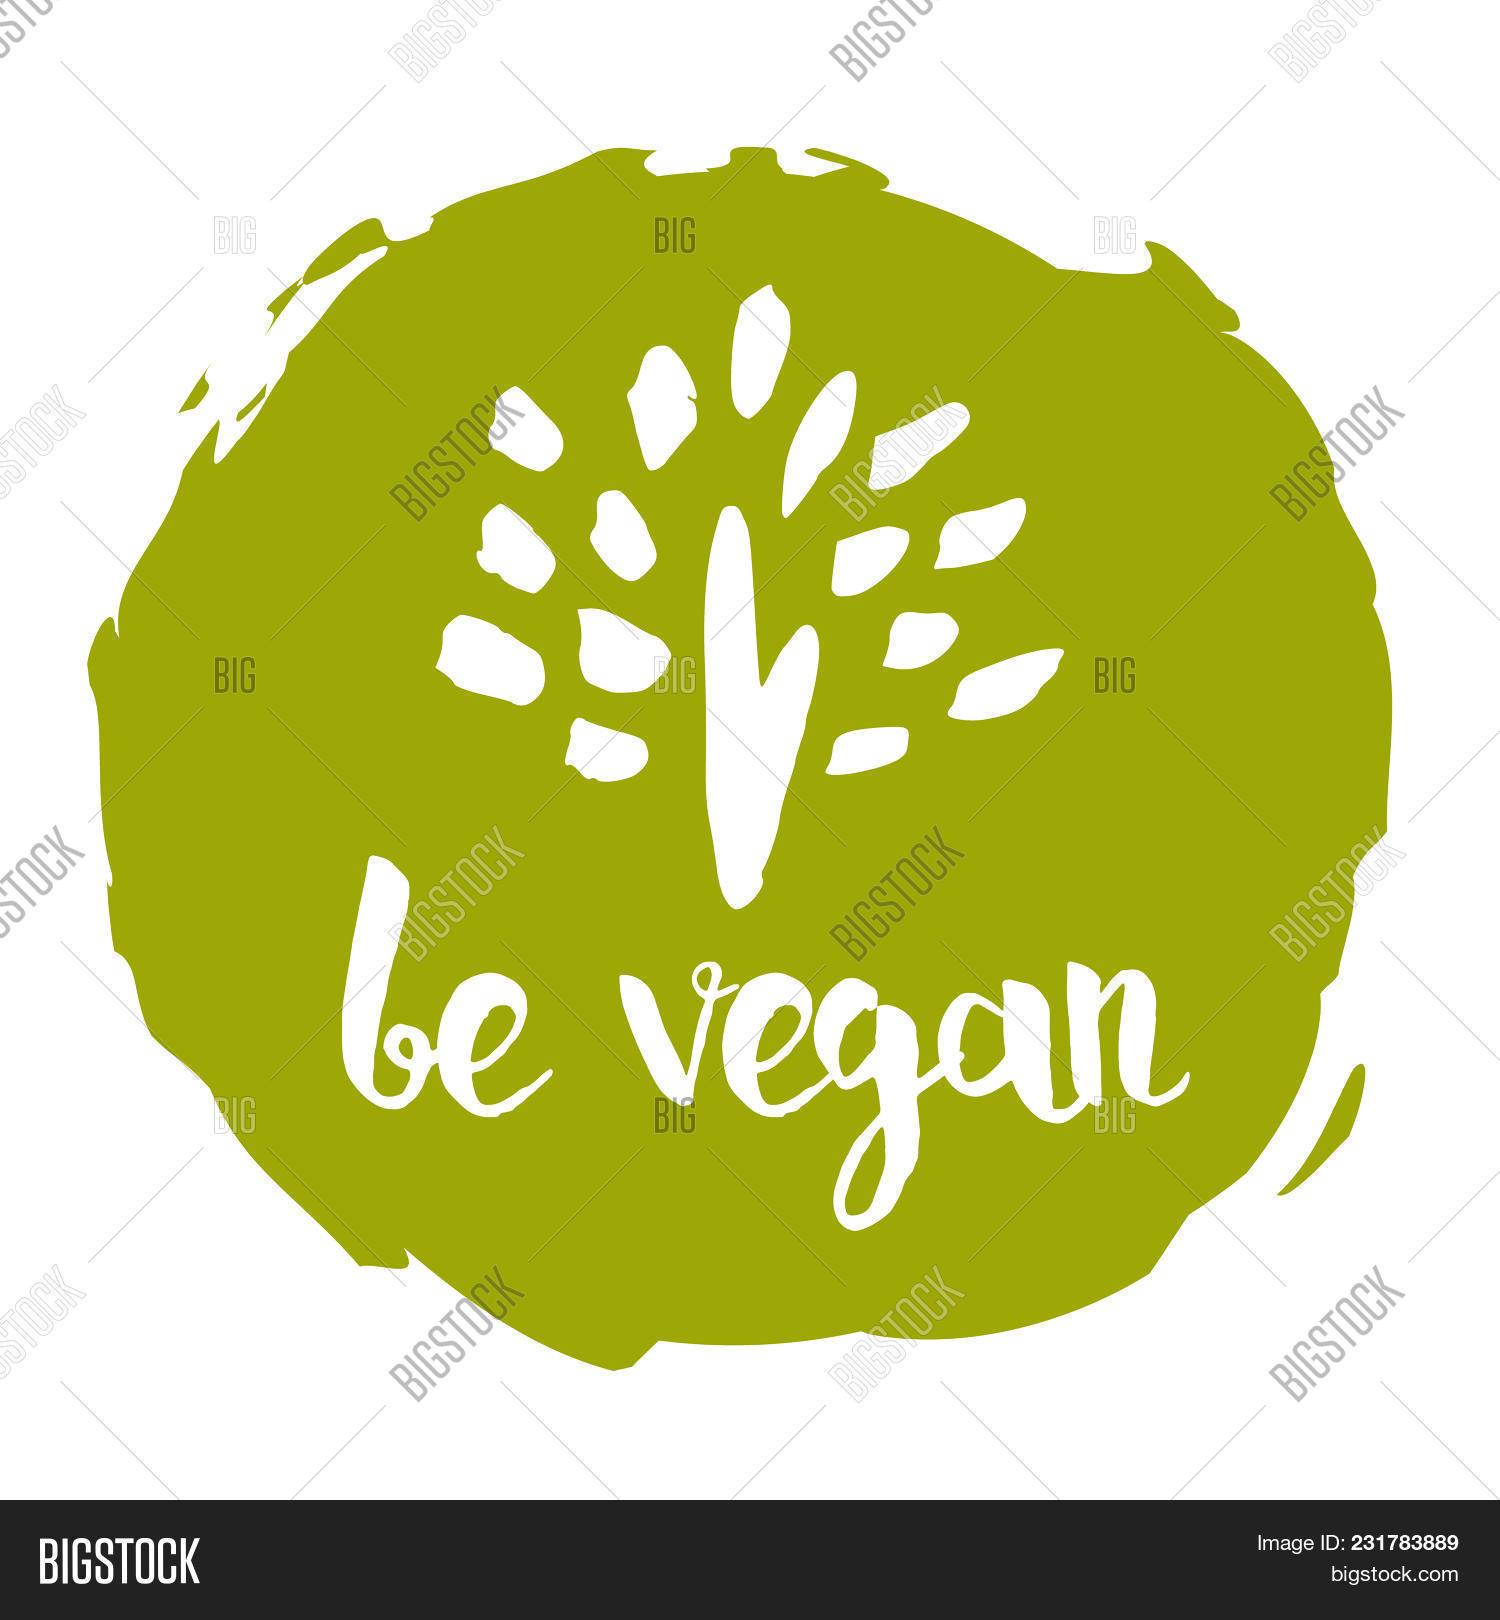 Be Vegan Hand Drawn Image & Photo (Free Trial)   Bigstock